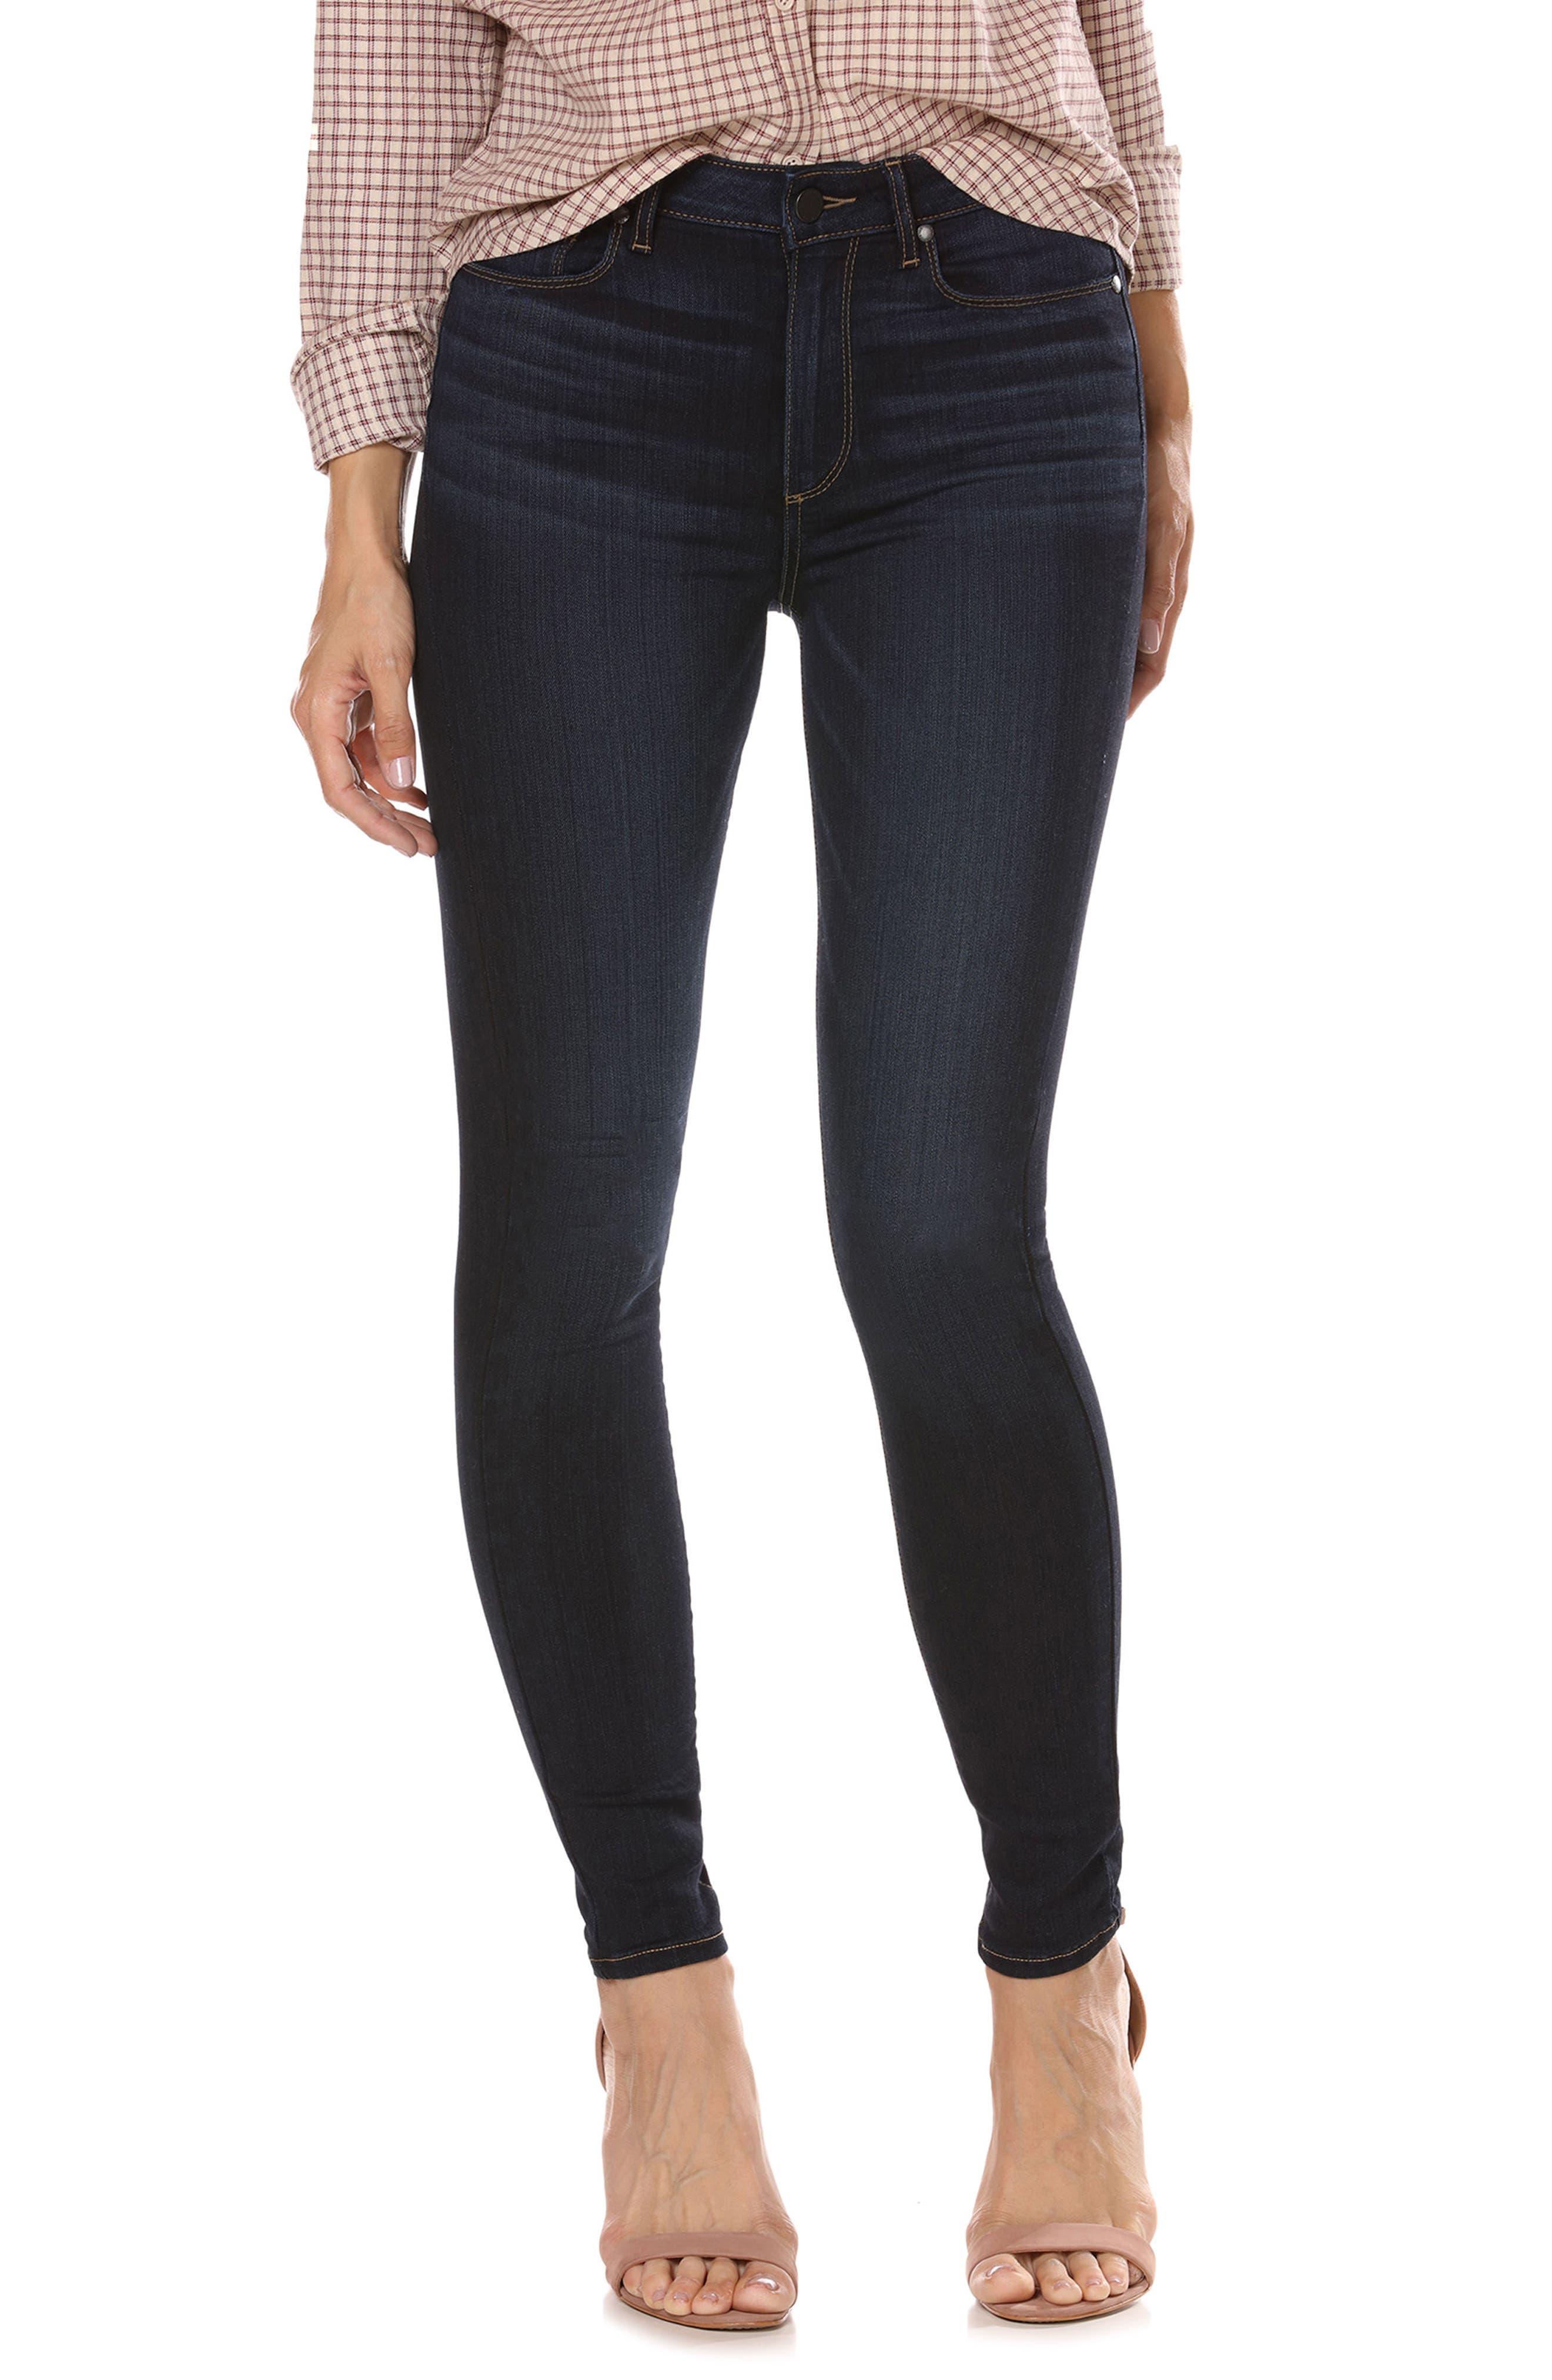 Transcend - Hoxton High Waist Ankle Skinny Jeans,                         Main,                         color, Koda